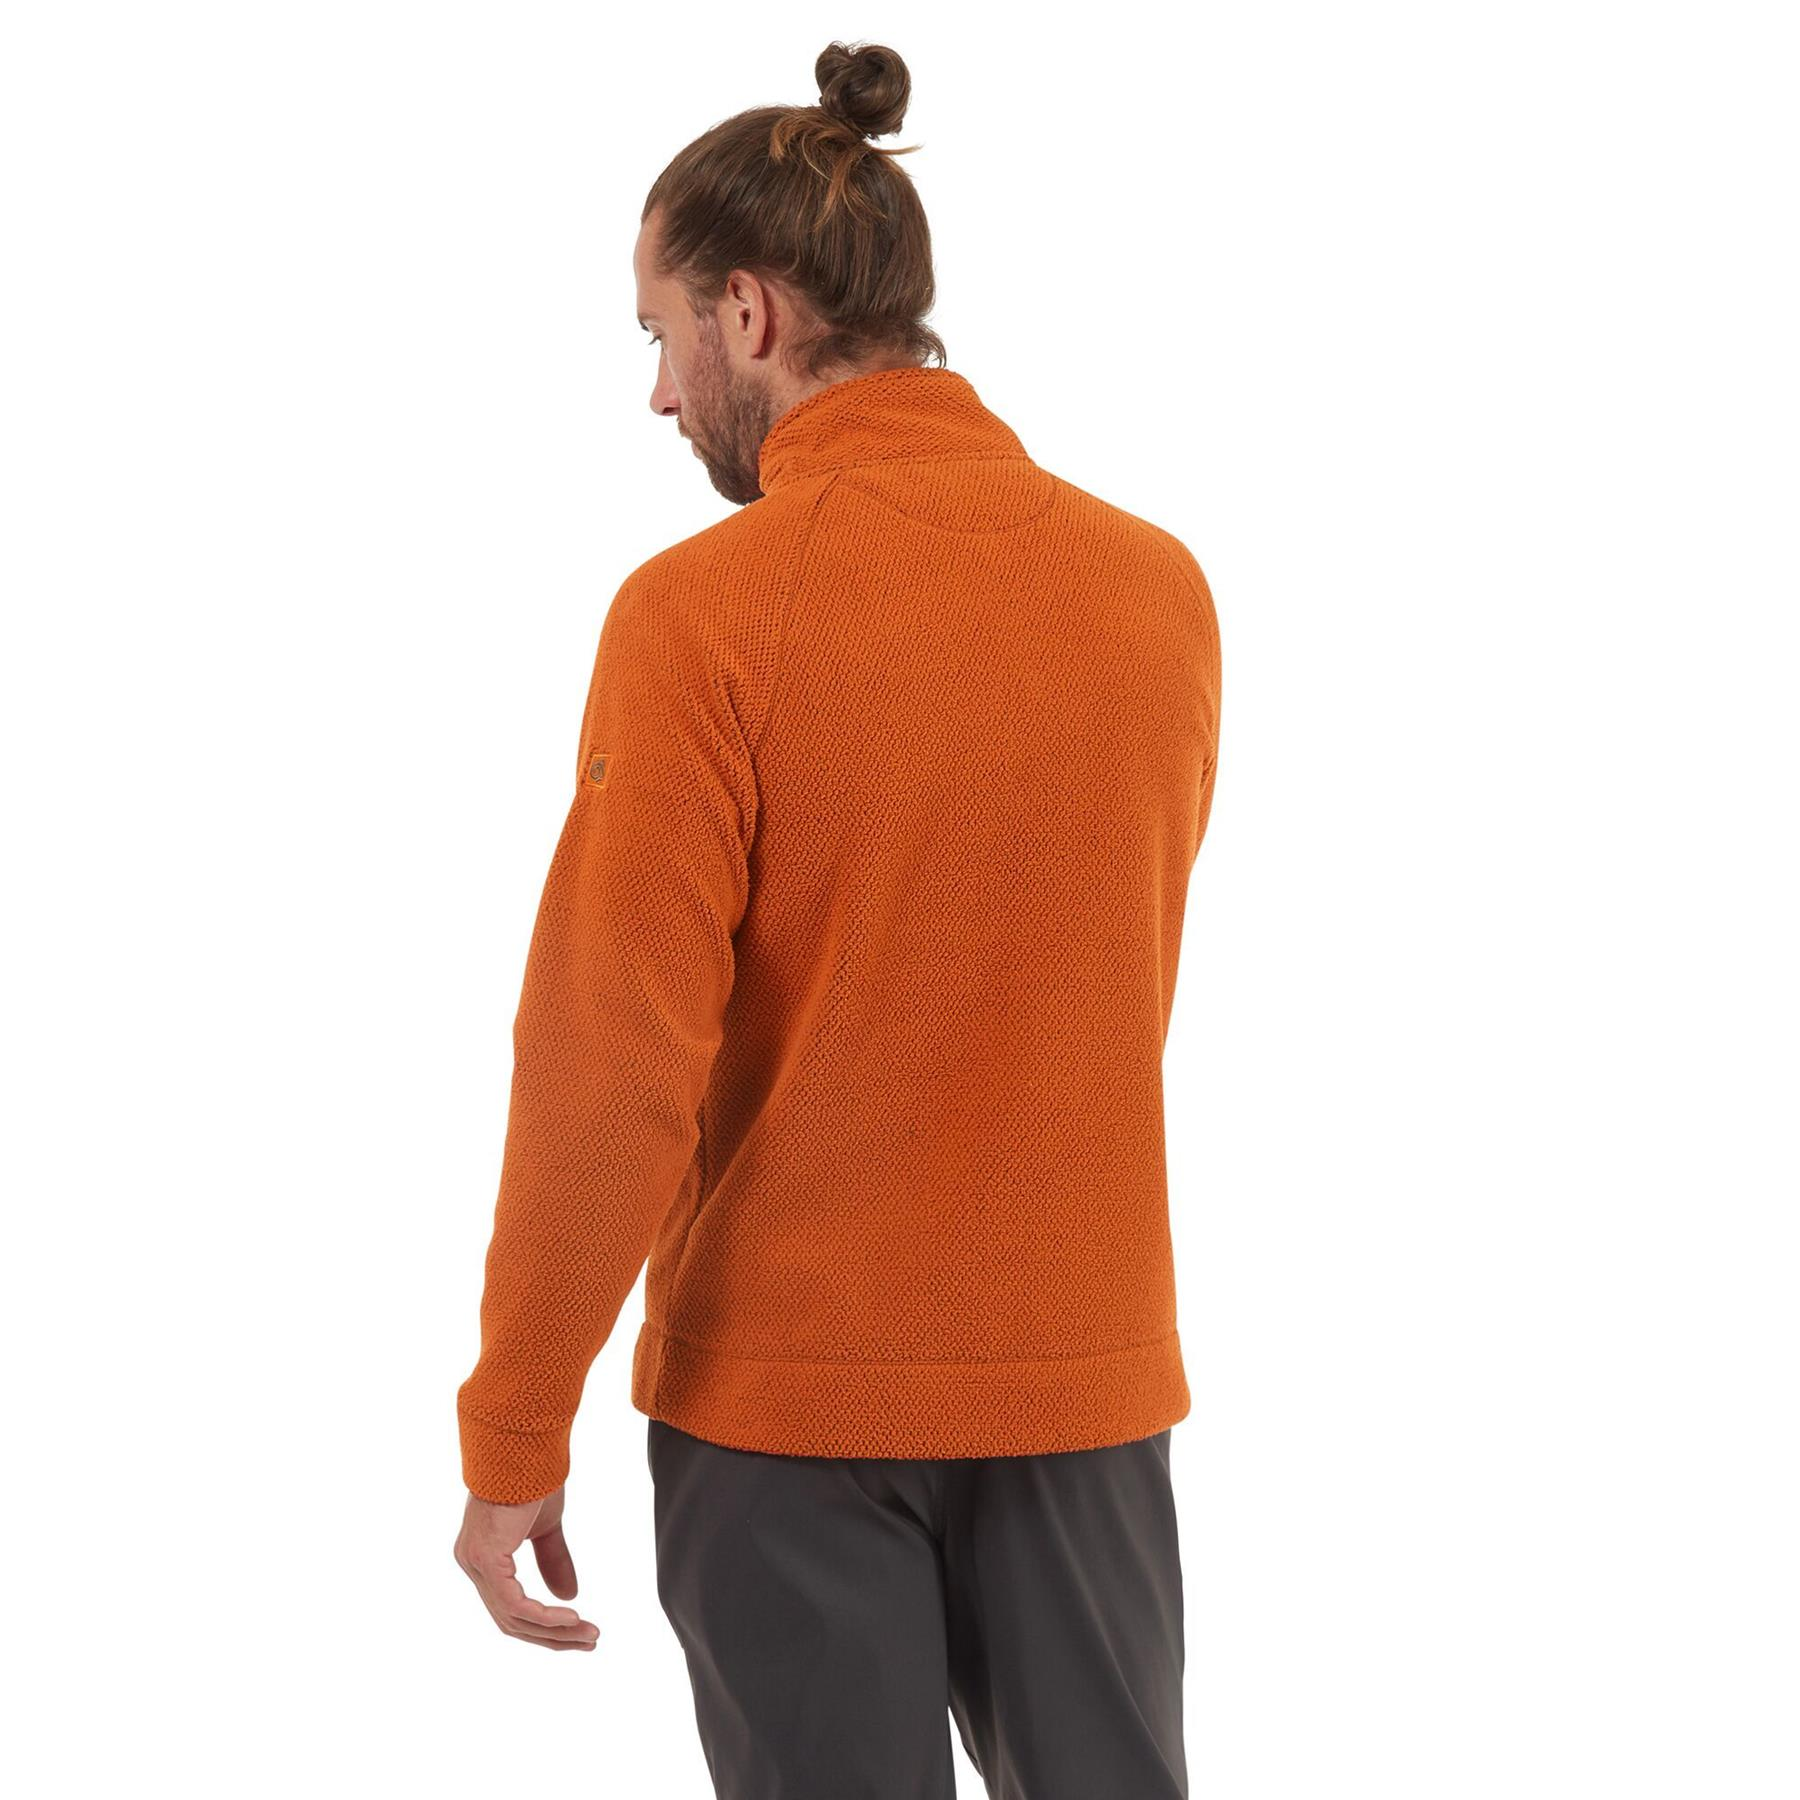 miniatuur 14 - Craghopper Mens Cason Fleece Half Zip Bobble Soft Jumper Pullover Sweater